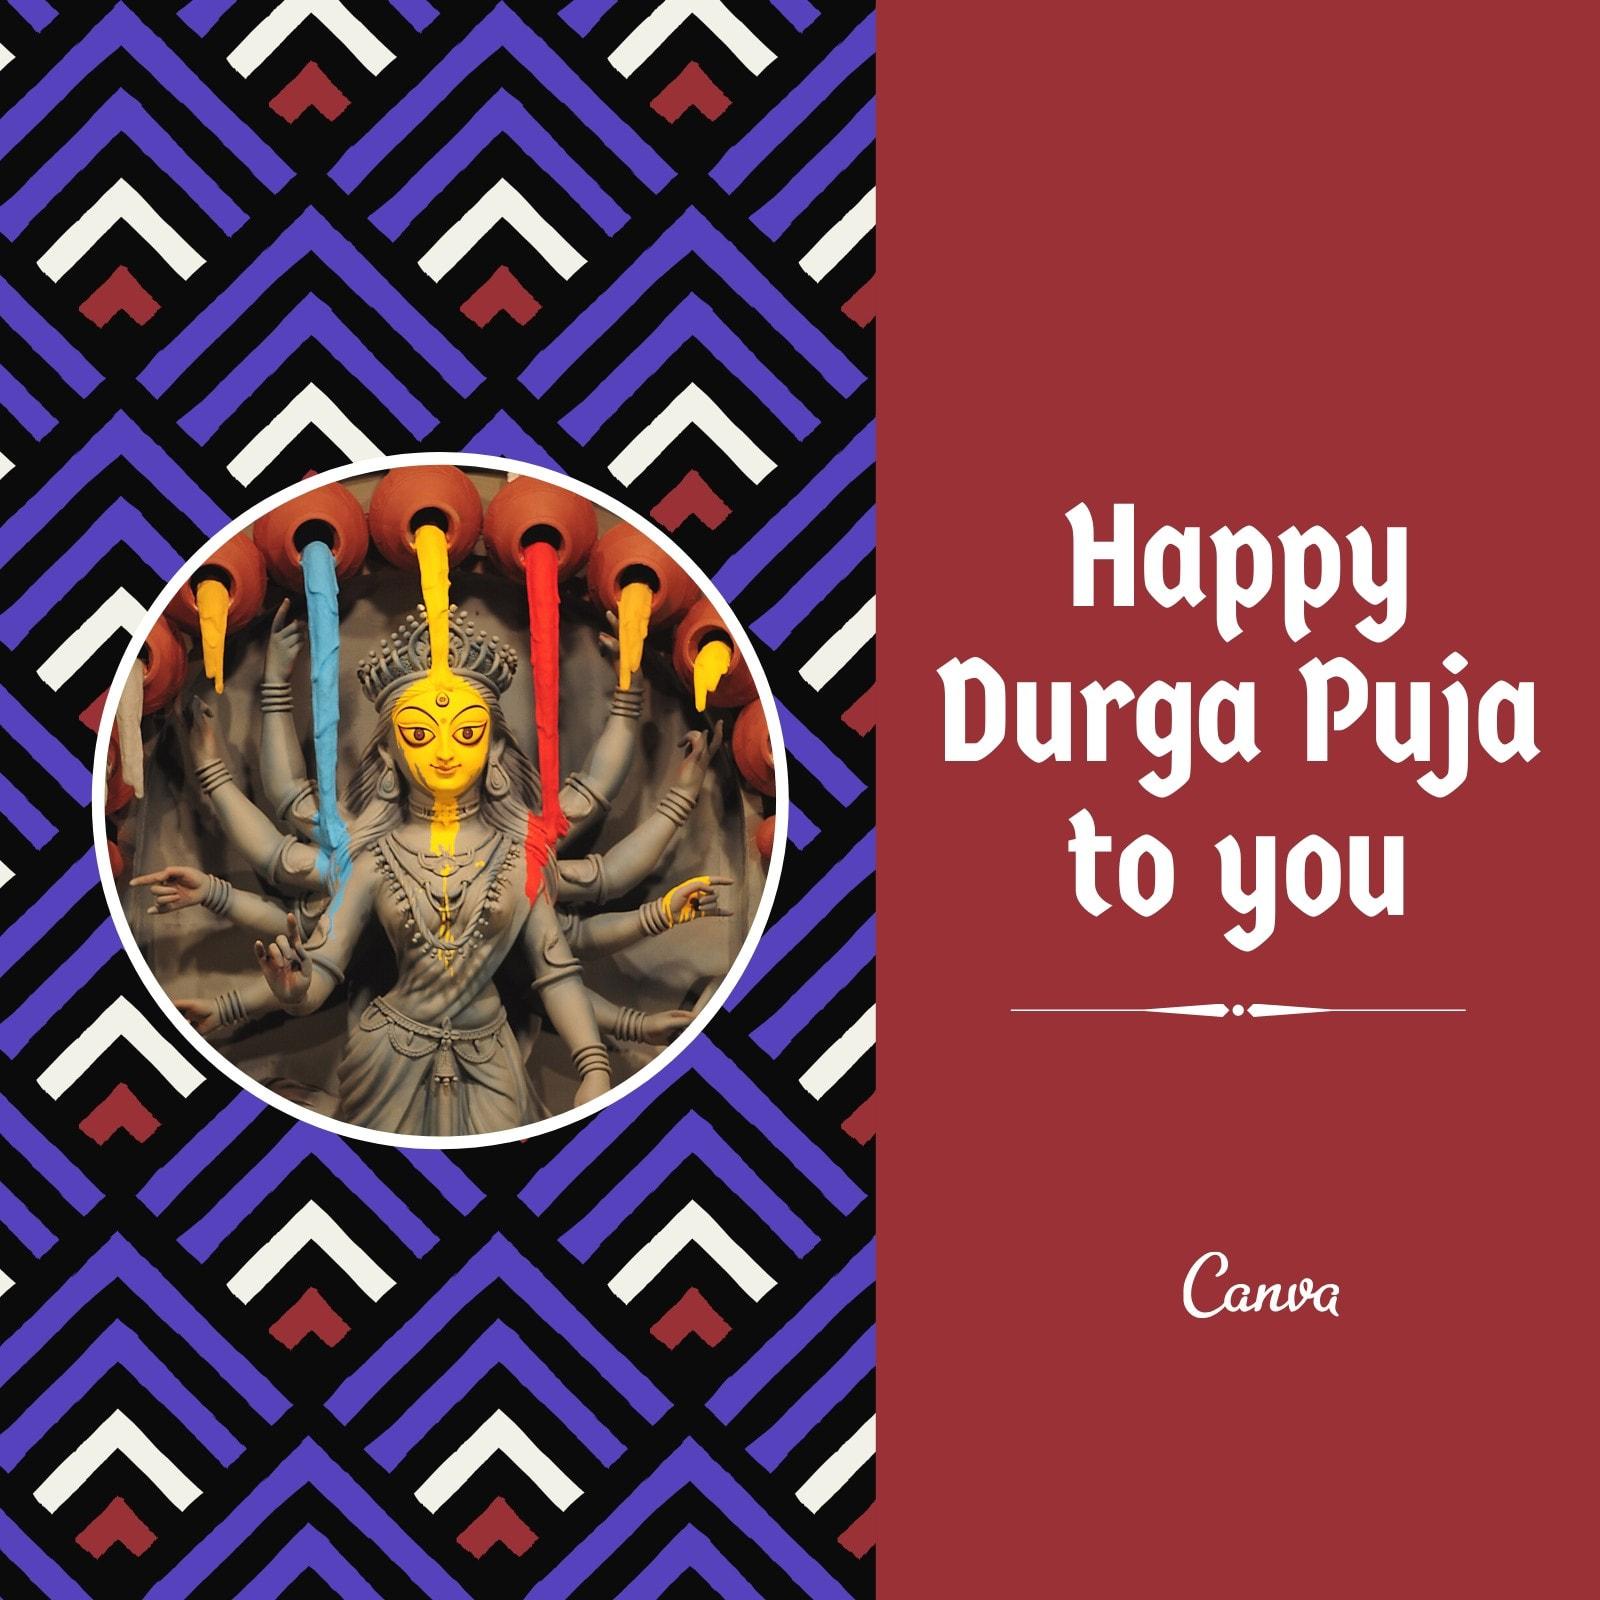 Maroon Lavander White Arrow Pattern Goddess Durga Puja Instagram Post